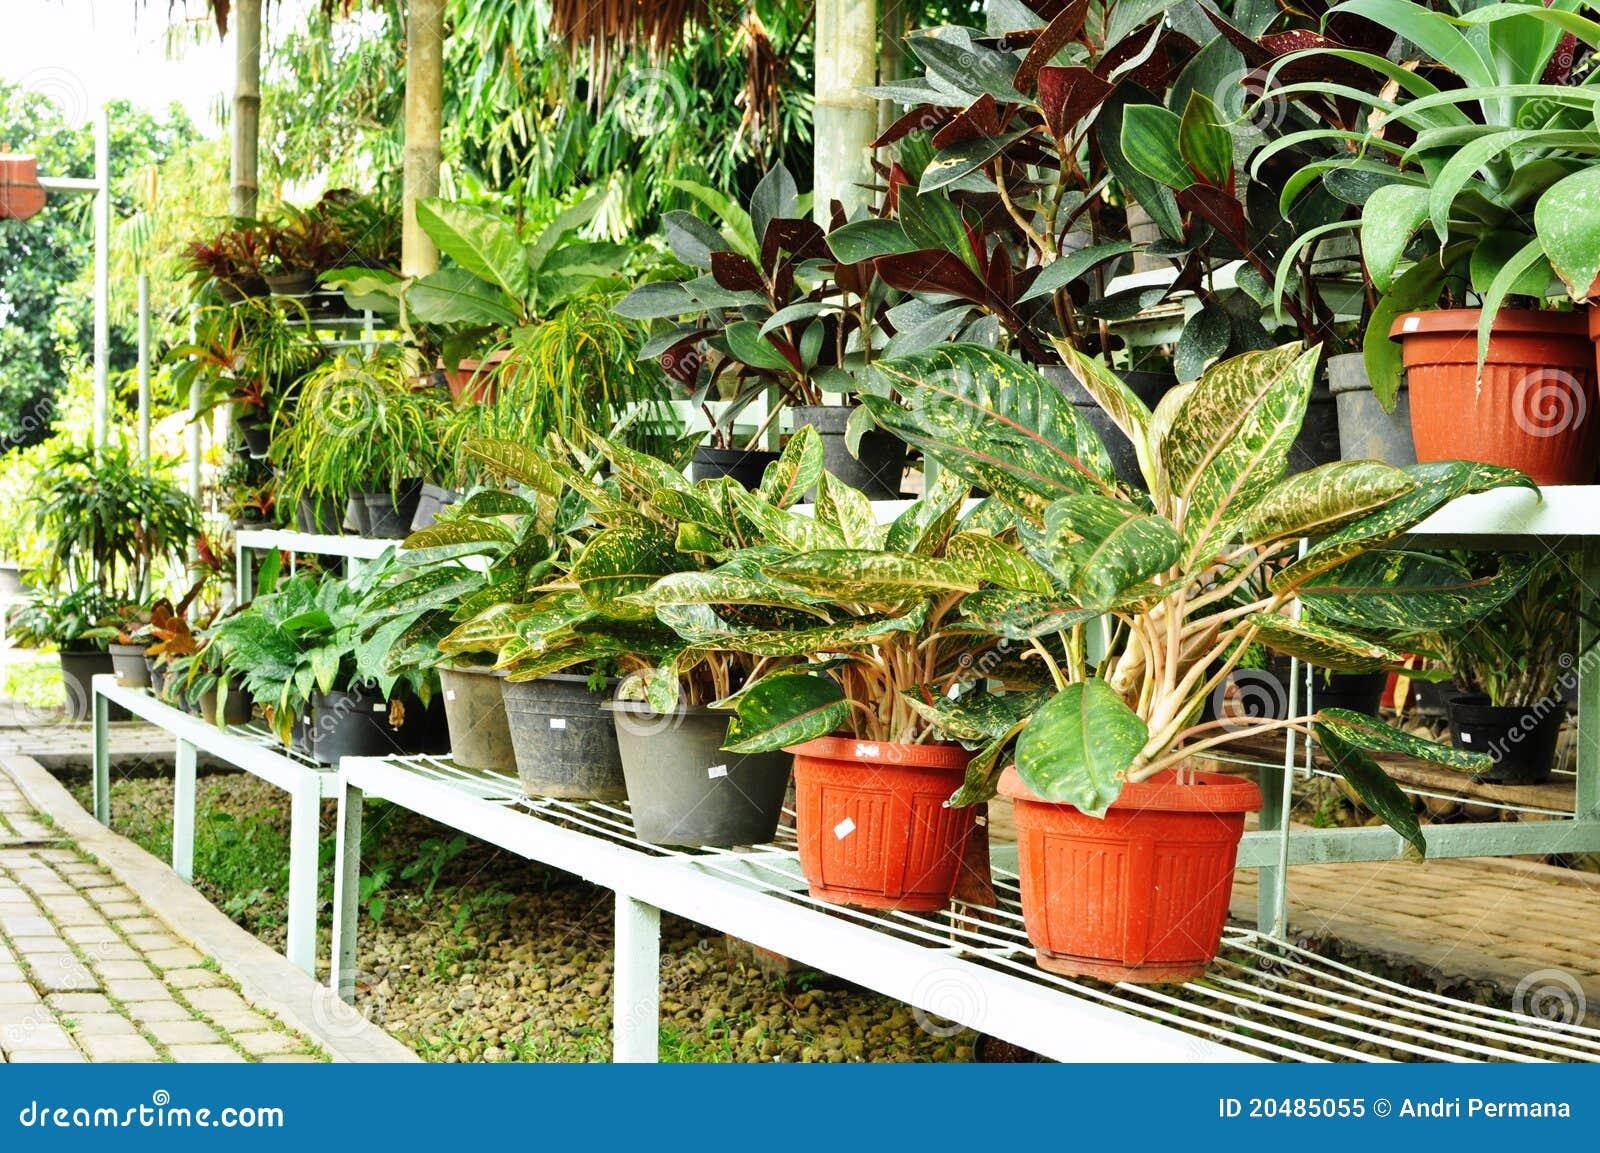 Ornamental plants shop stock image image of trees tree for Design of ornamental plants